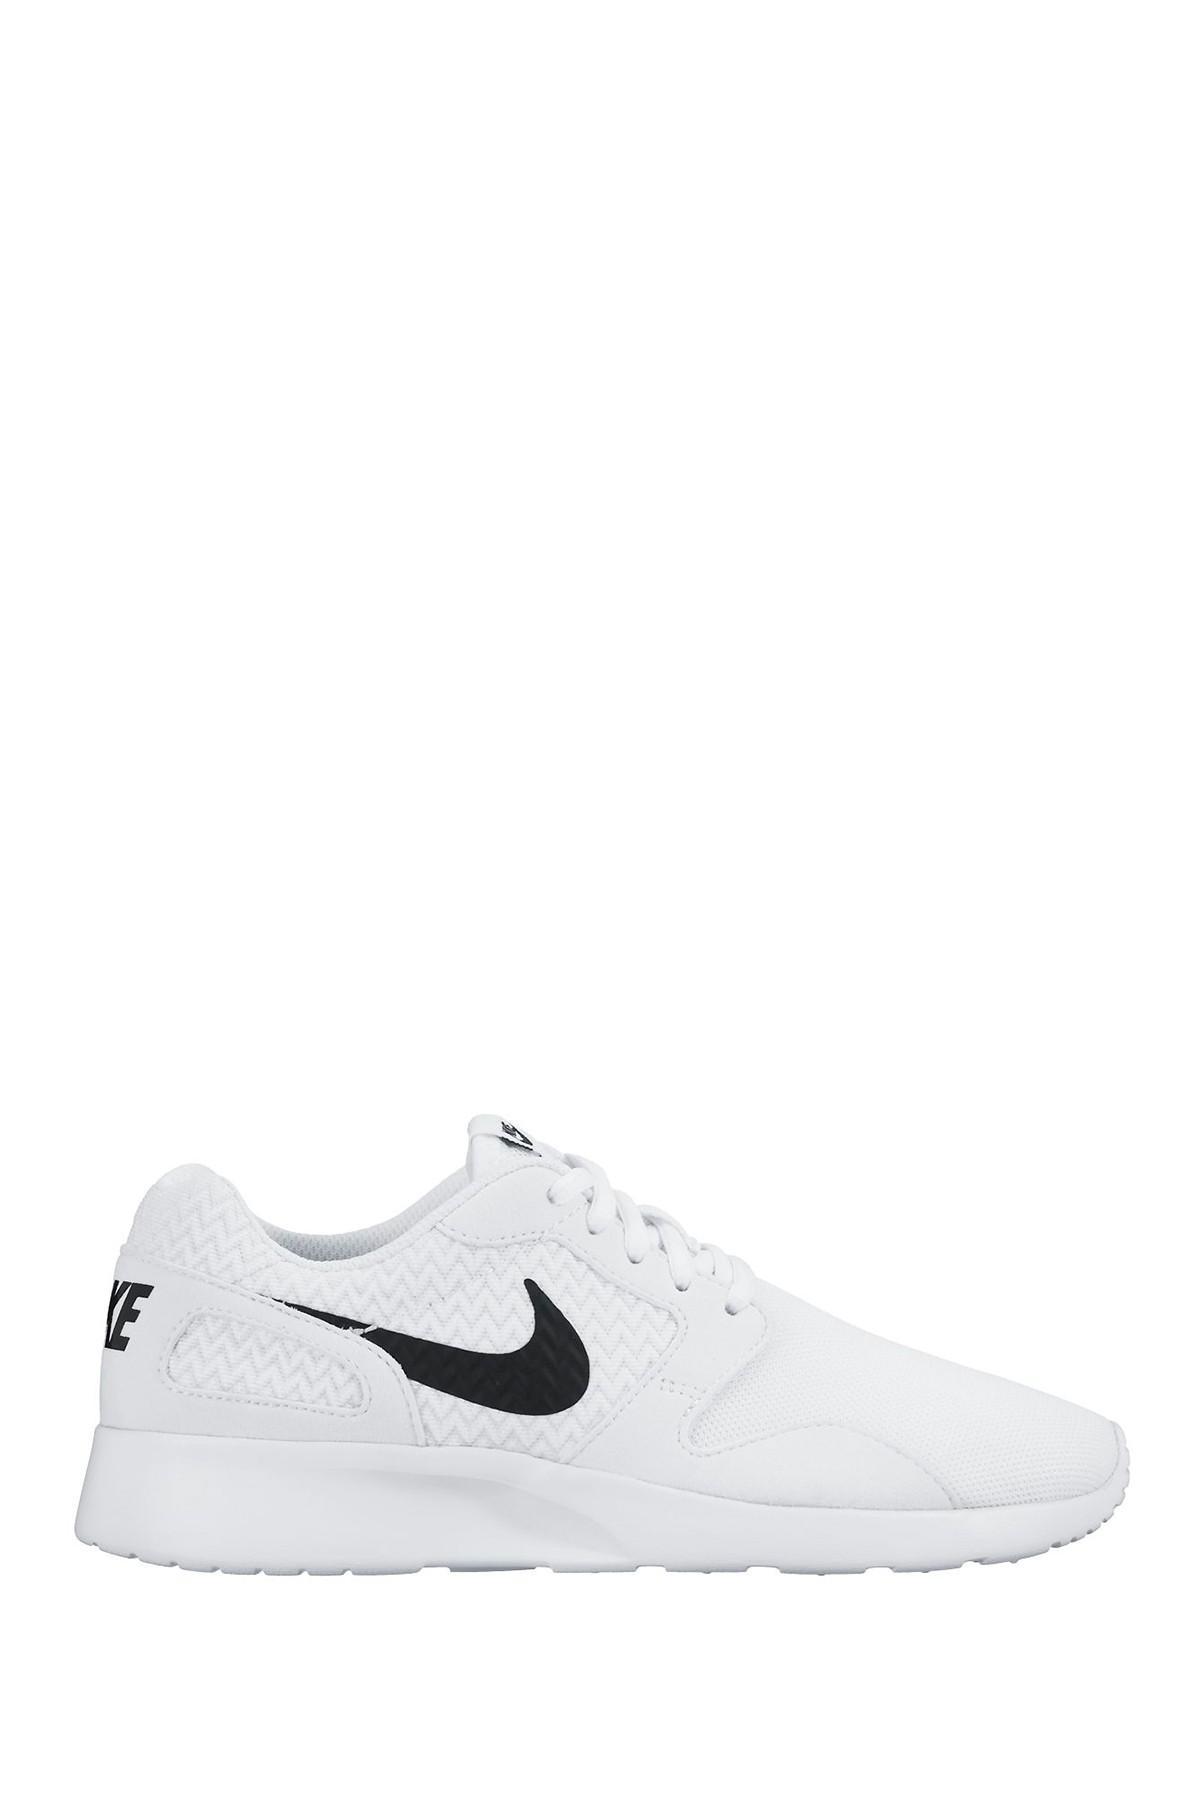 5f036cad2ed9 Lyst - Nike Kaishi Running Sneaker in White